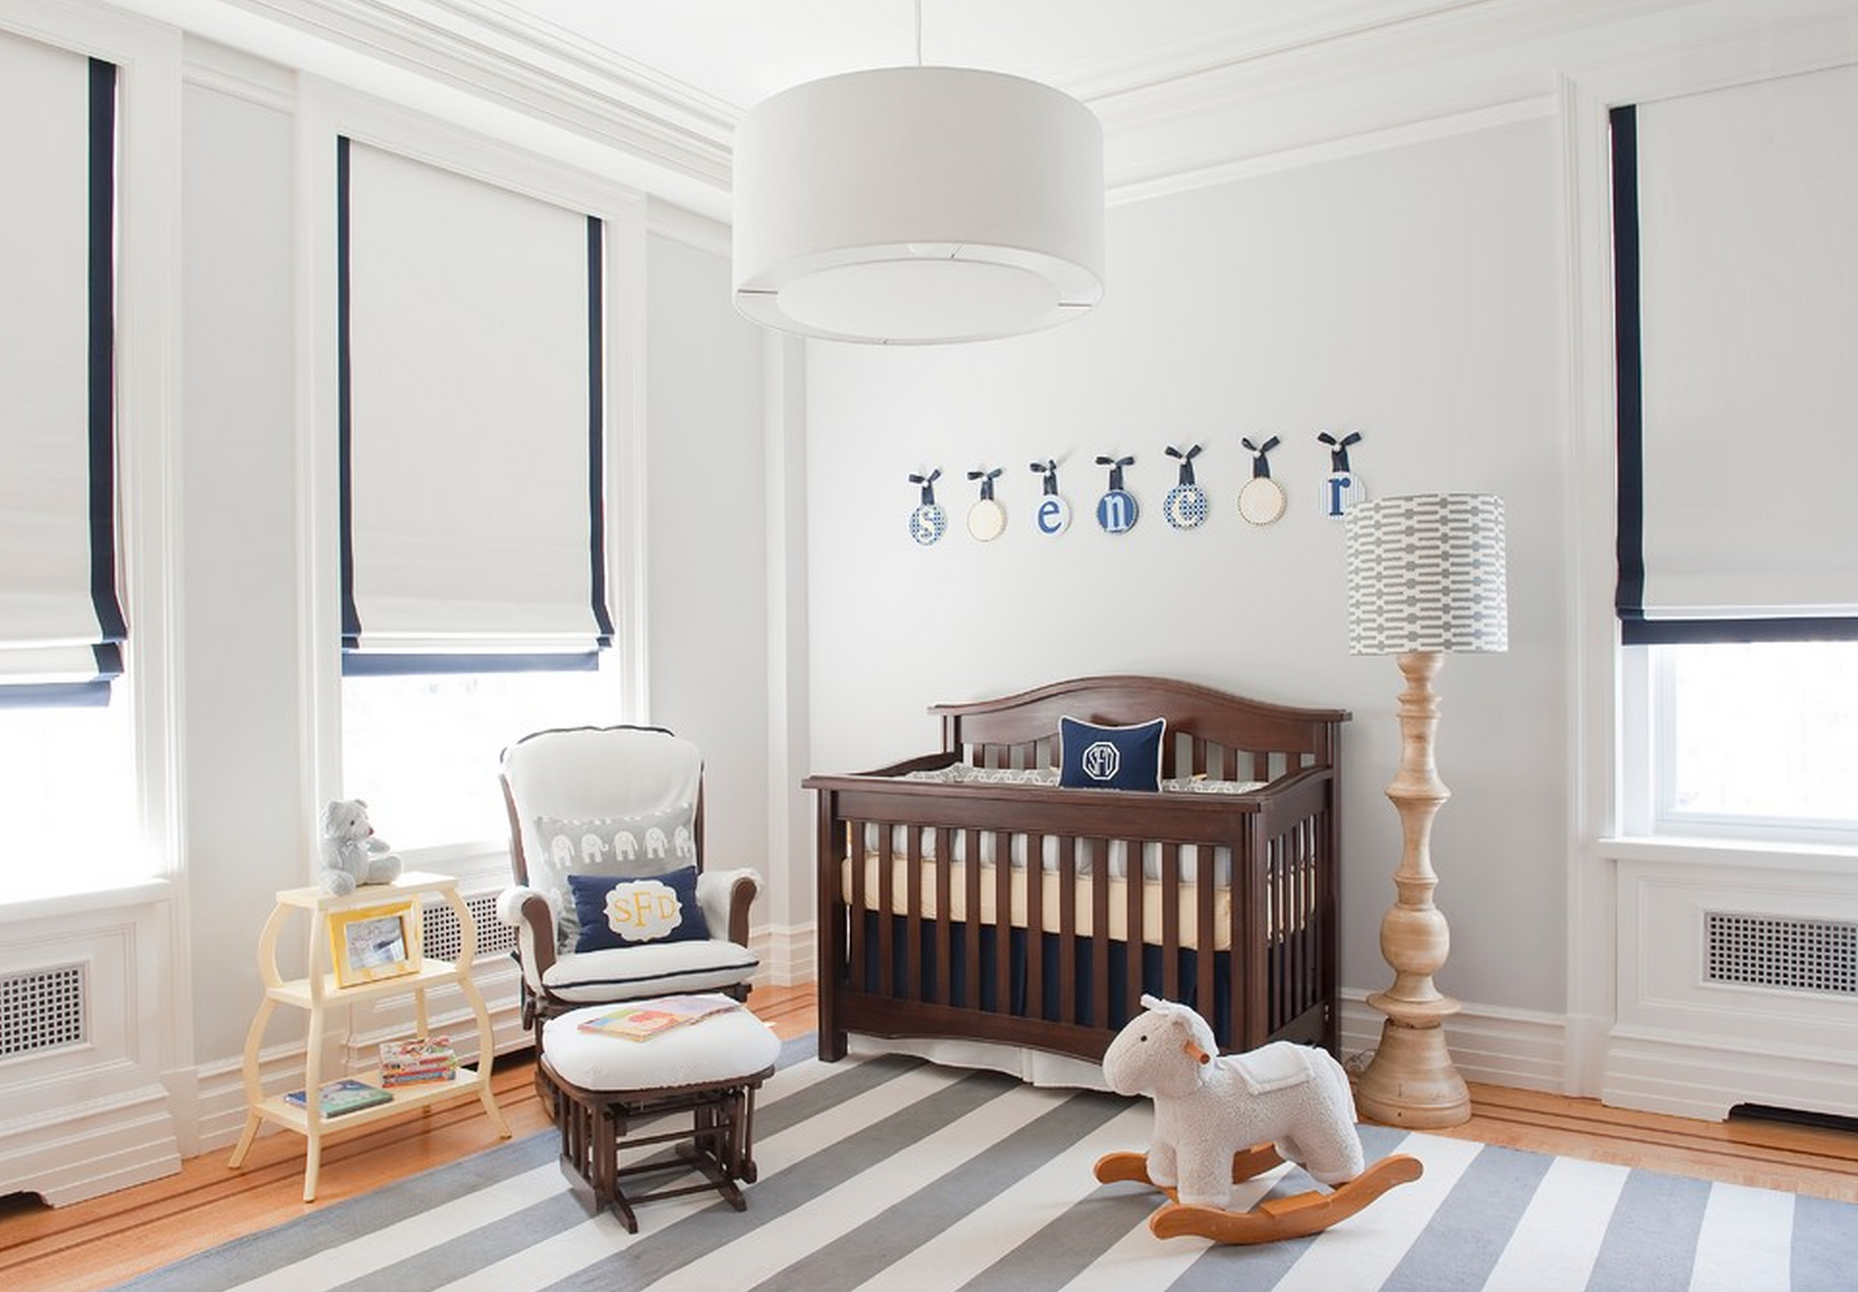 Tapetes para quarto de Bebe decorandoonline ~ Tapetes Quarto Nenem